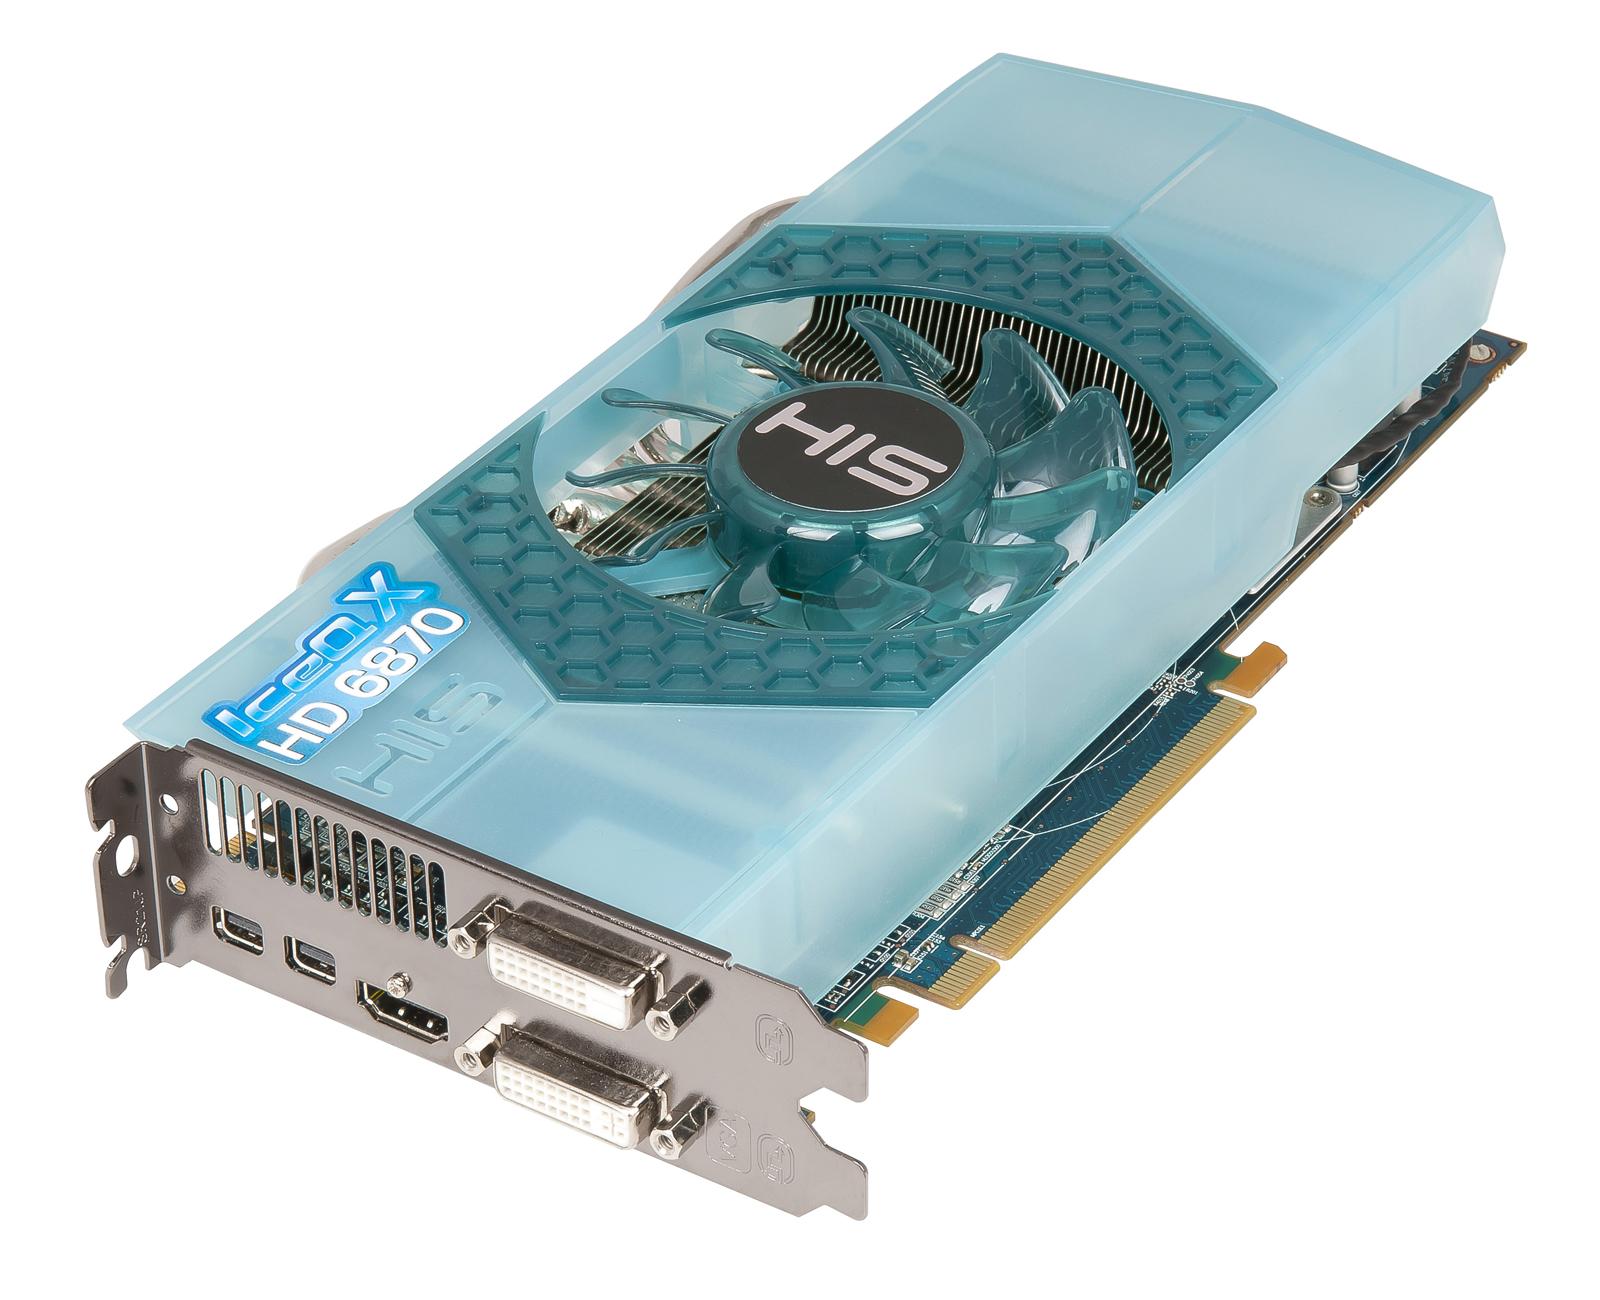 HIS 6870 IceQ X 1GB GDDR5 PCI-E HDMI/2xDVI/2xMini DP